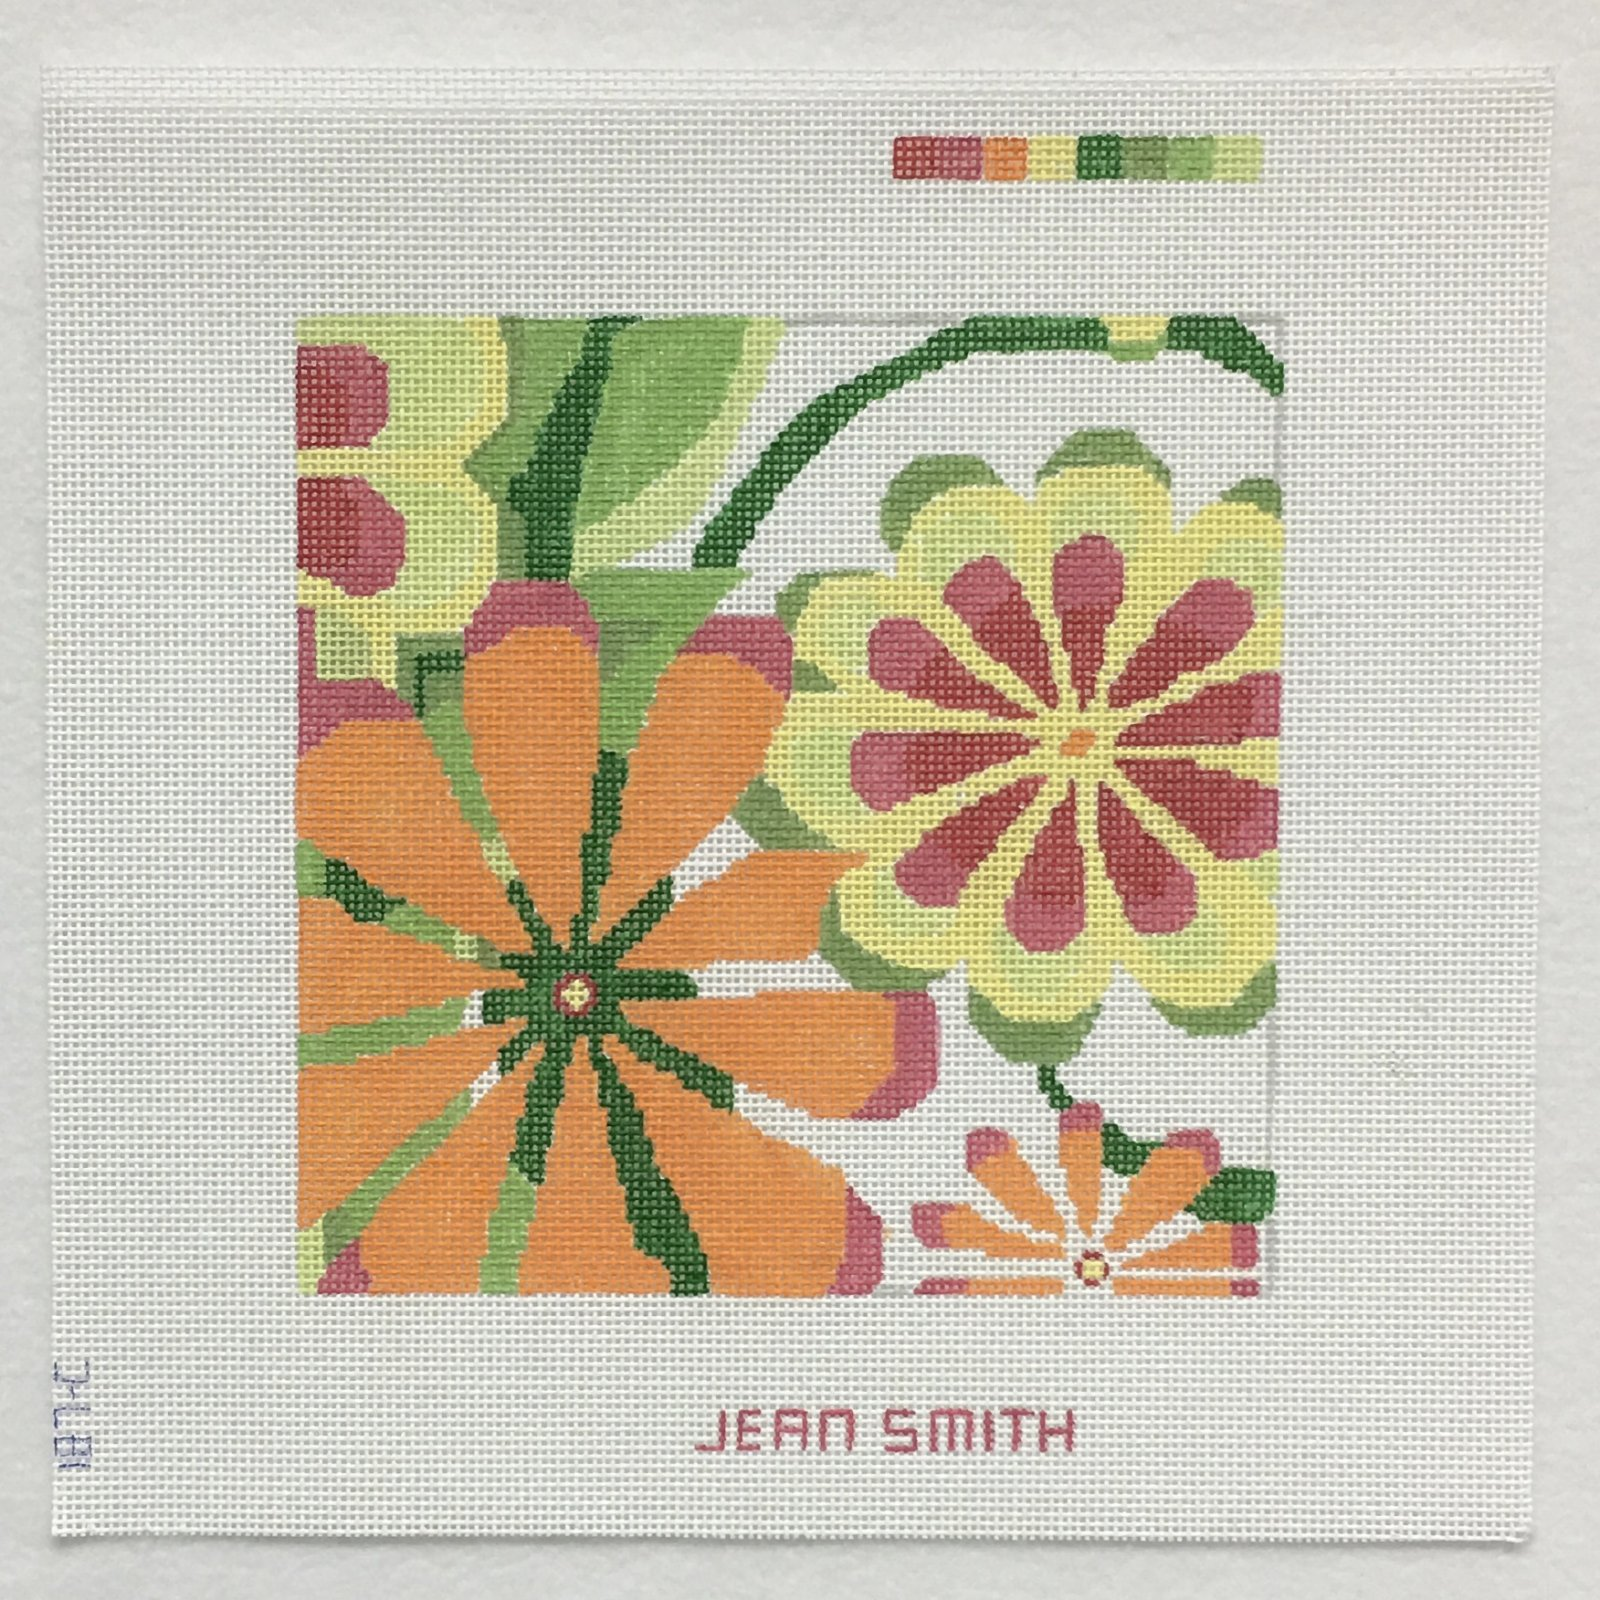 187C-2 Small Orange Sherbet Garden